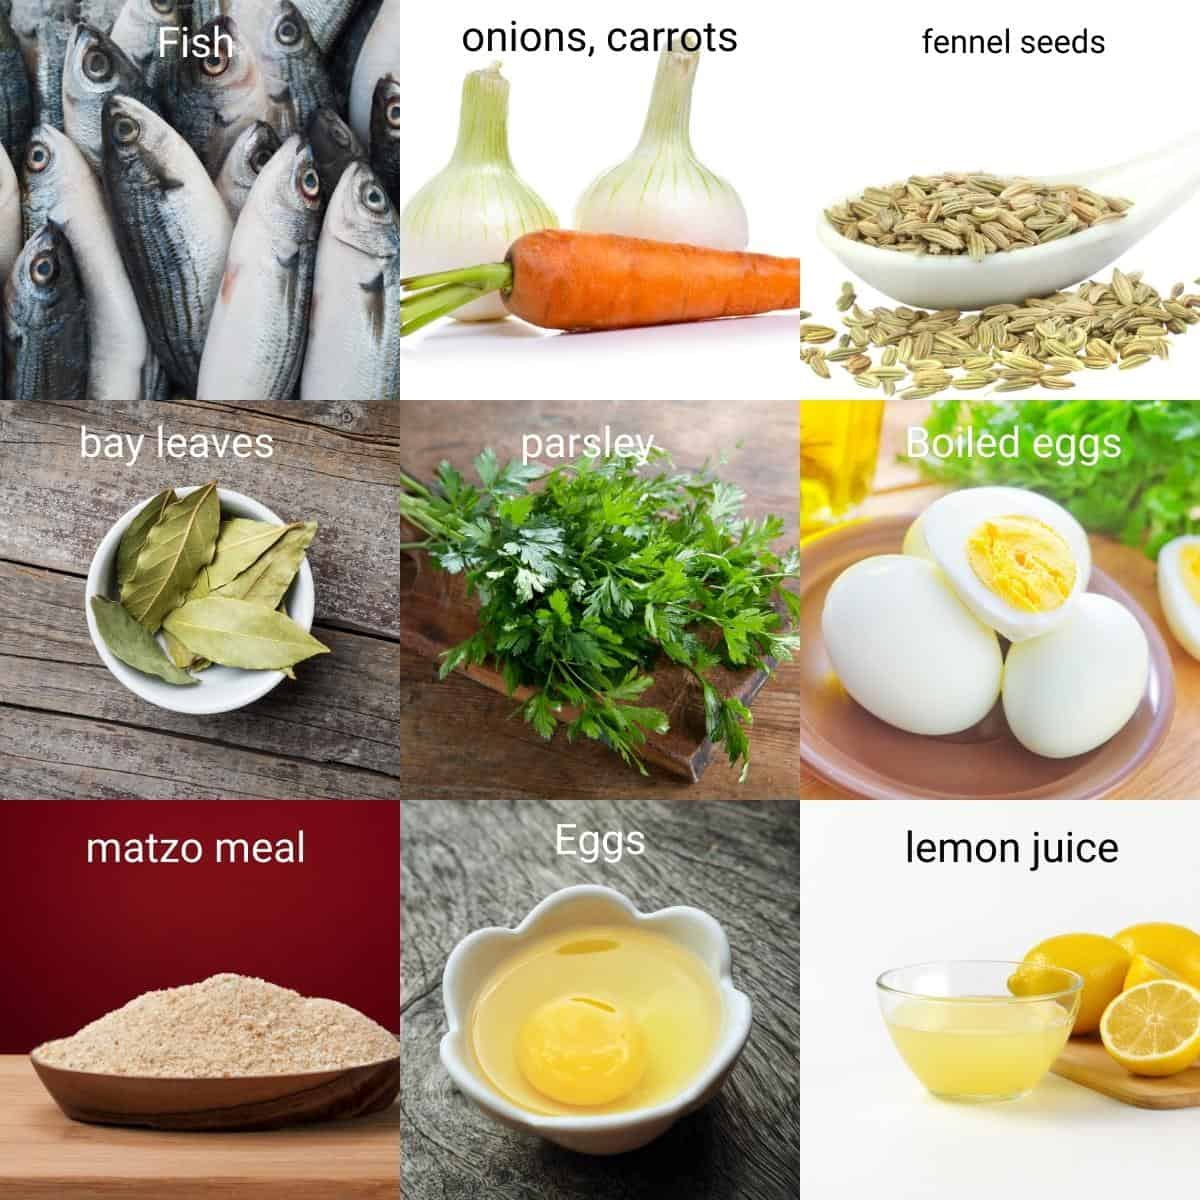 Ingredients shot collage for Gefilte Fish.